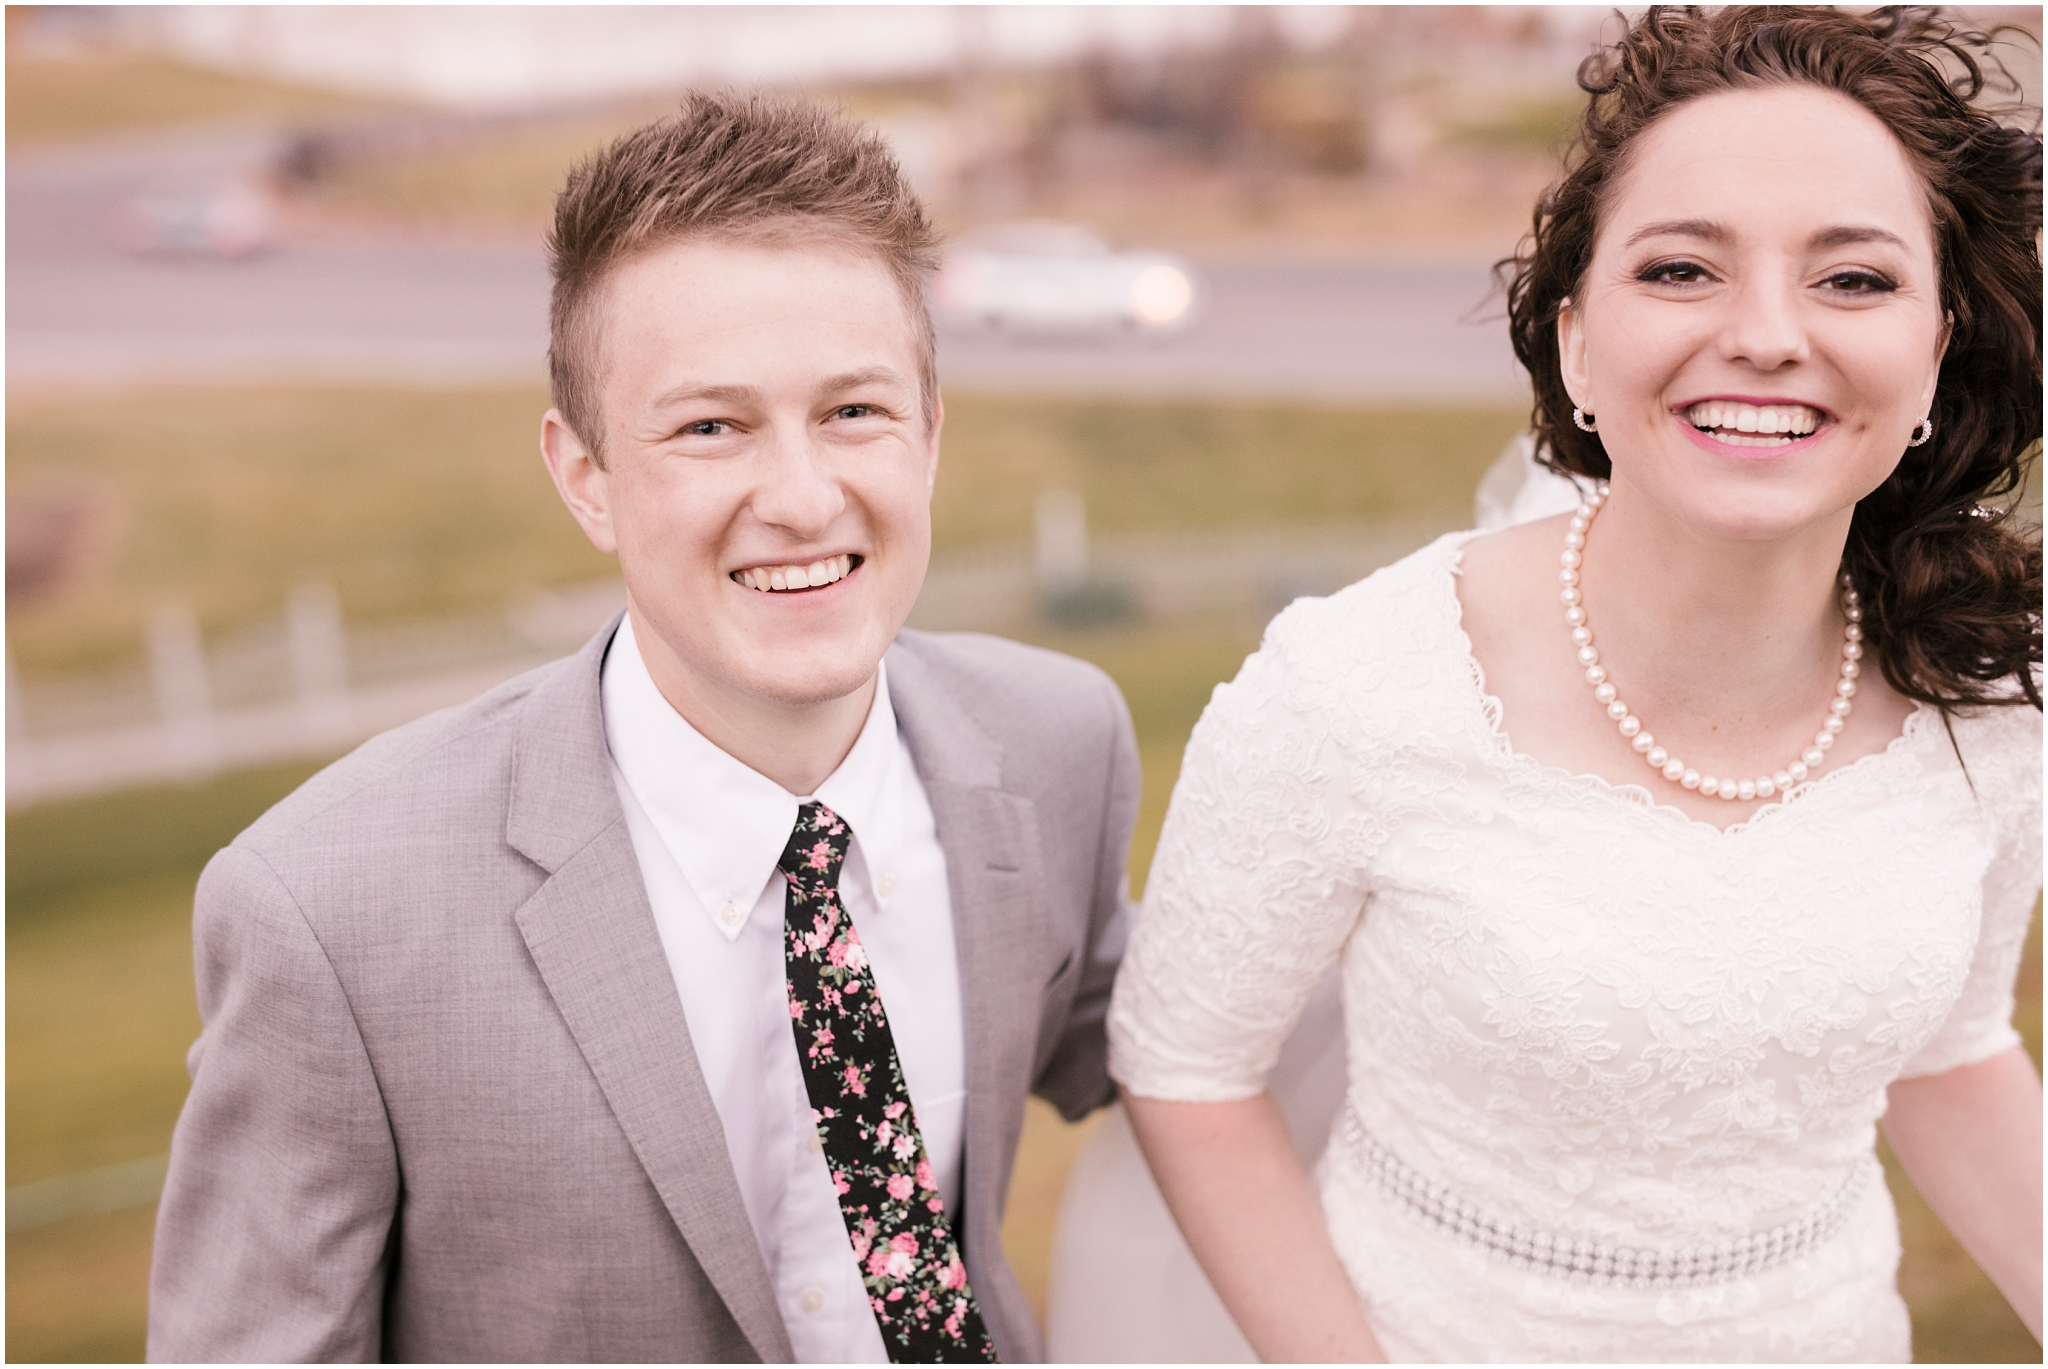 BA-Bridals-102_Lizzie-B-Imagery-Utah-Wedding-Photographer-Central-Utah-Photographer-Utah-County-Manti-Utah-Temple.jpg